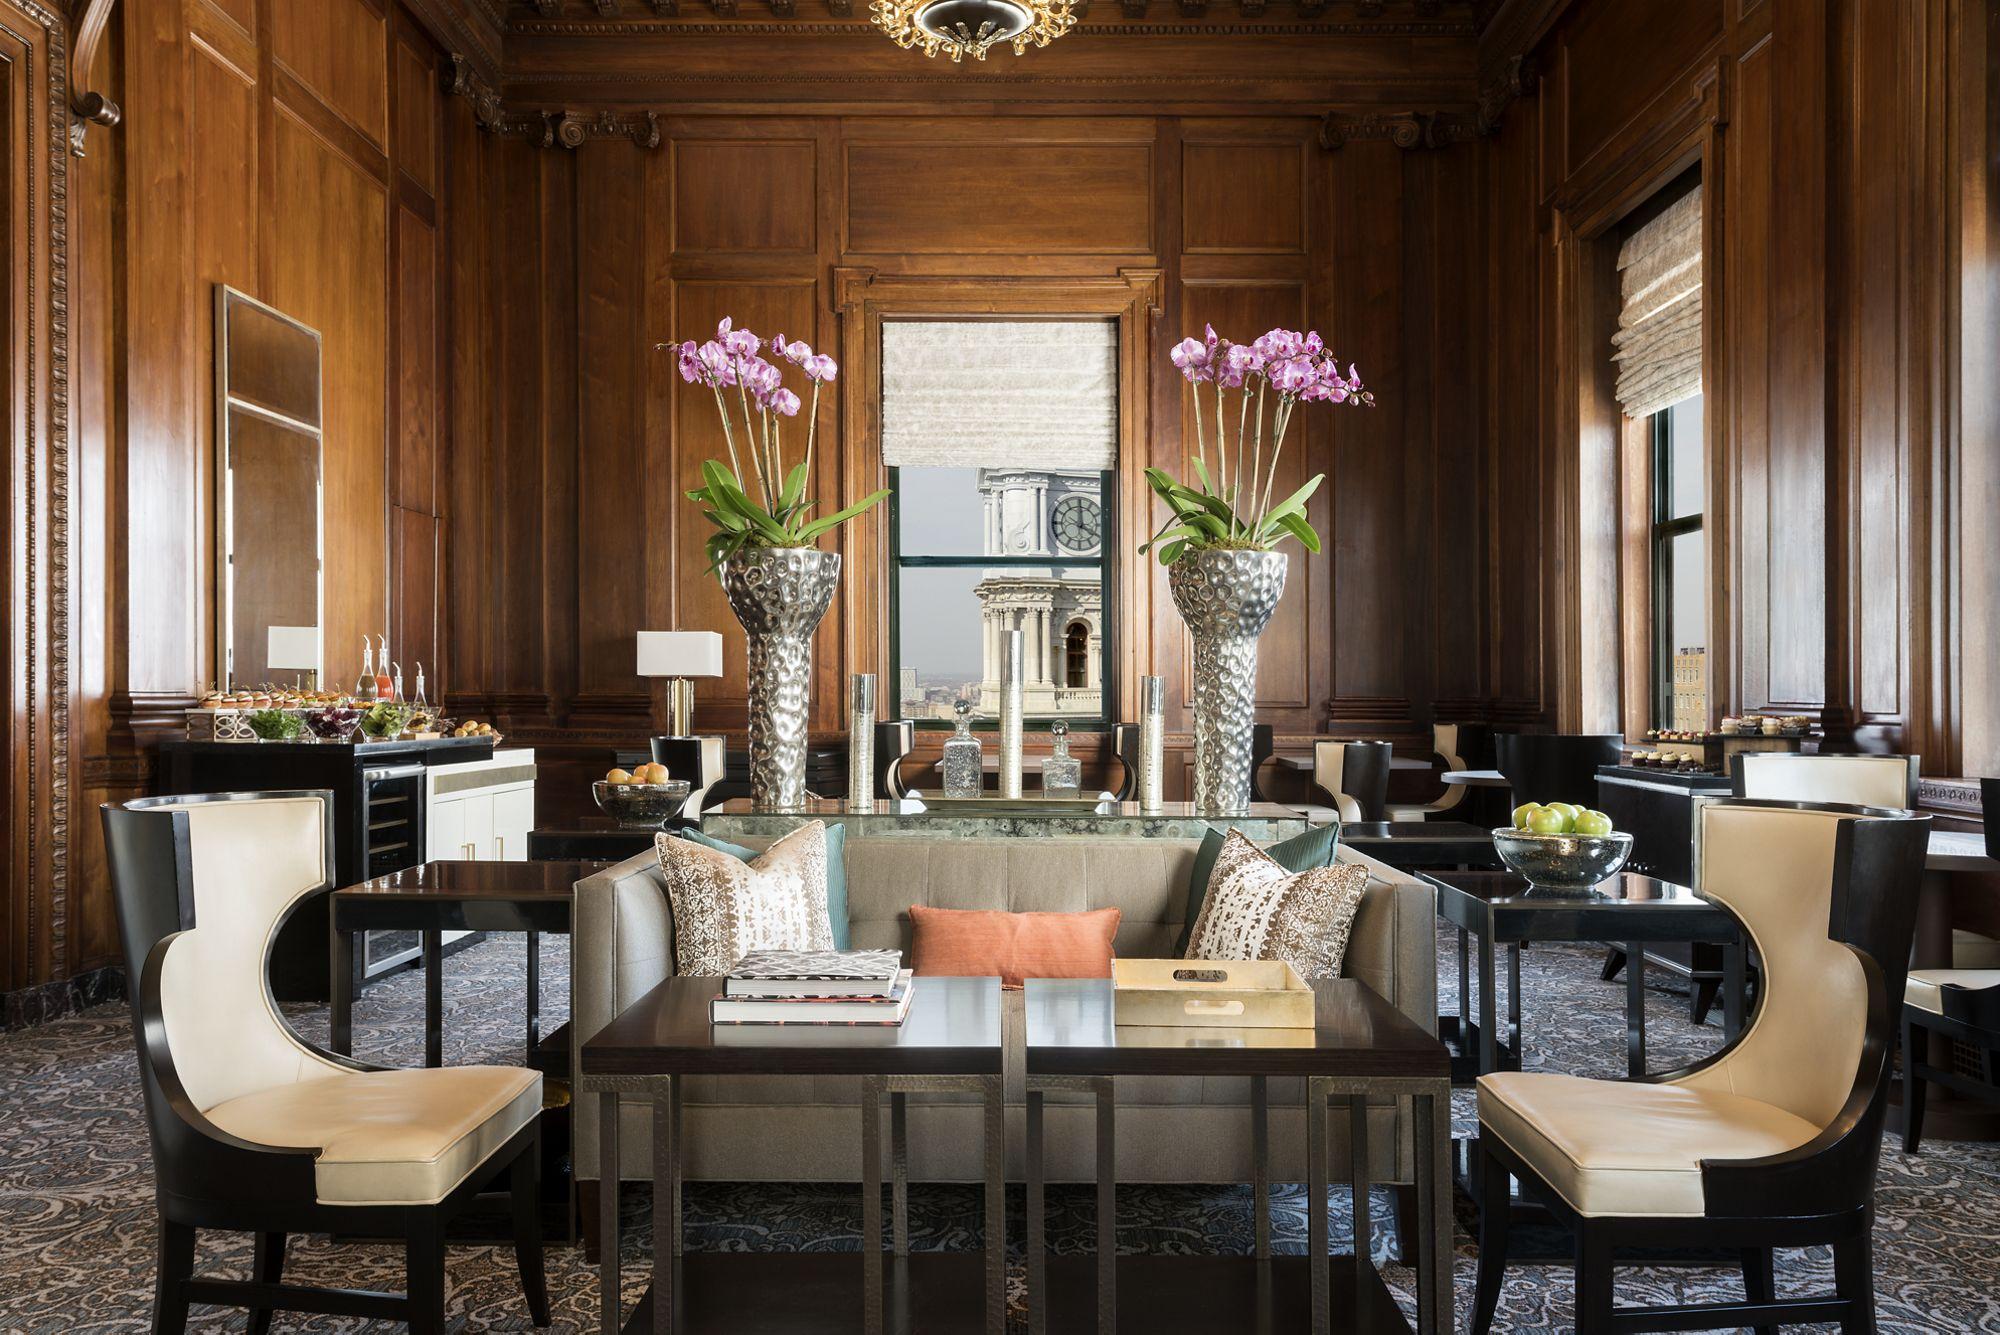 Swell Renovation Design The Ritz Carlton Philadelphia Download Free Architecture Designs Crovemadebymaigaardcom